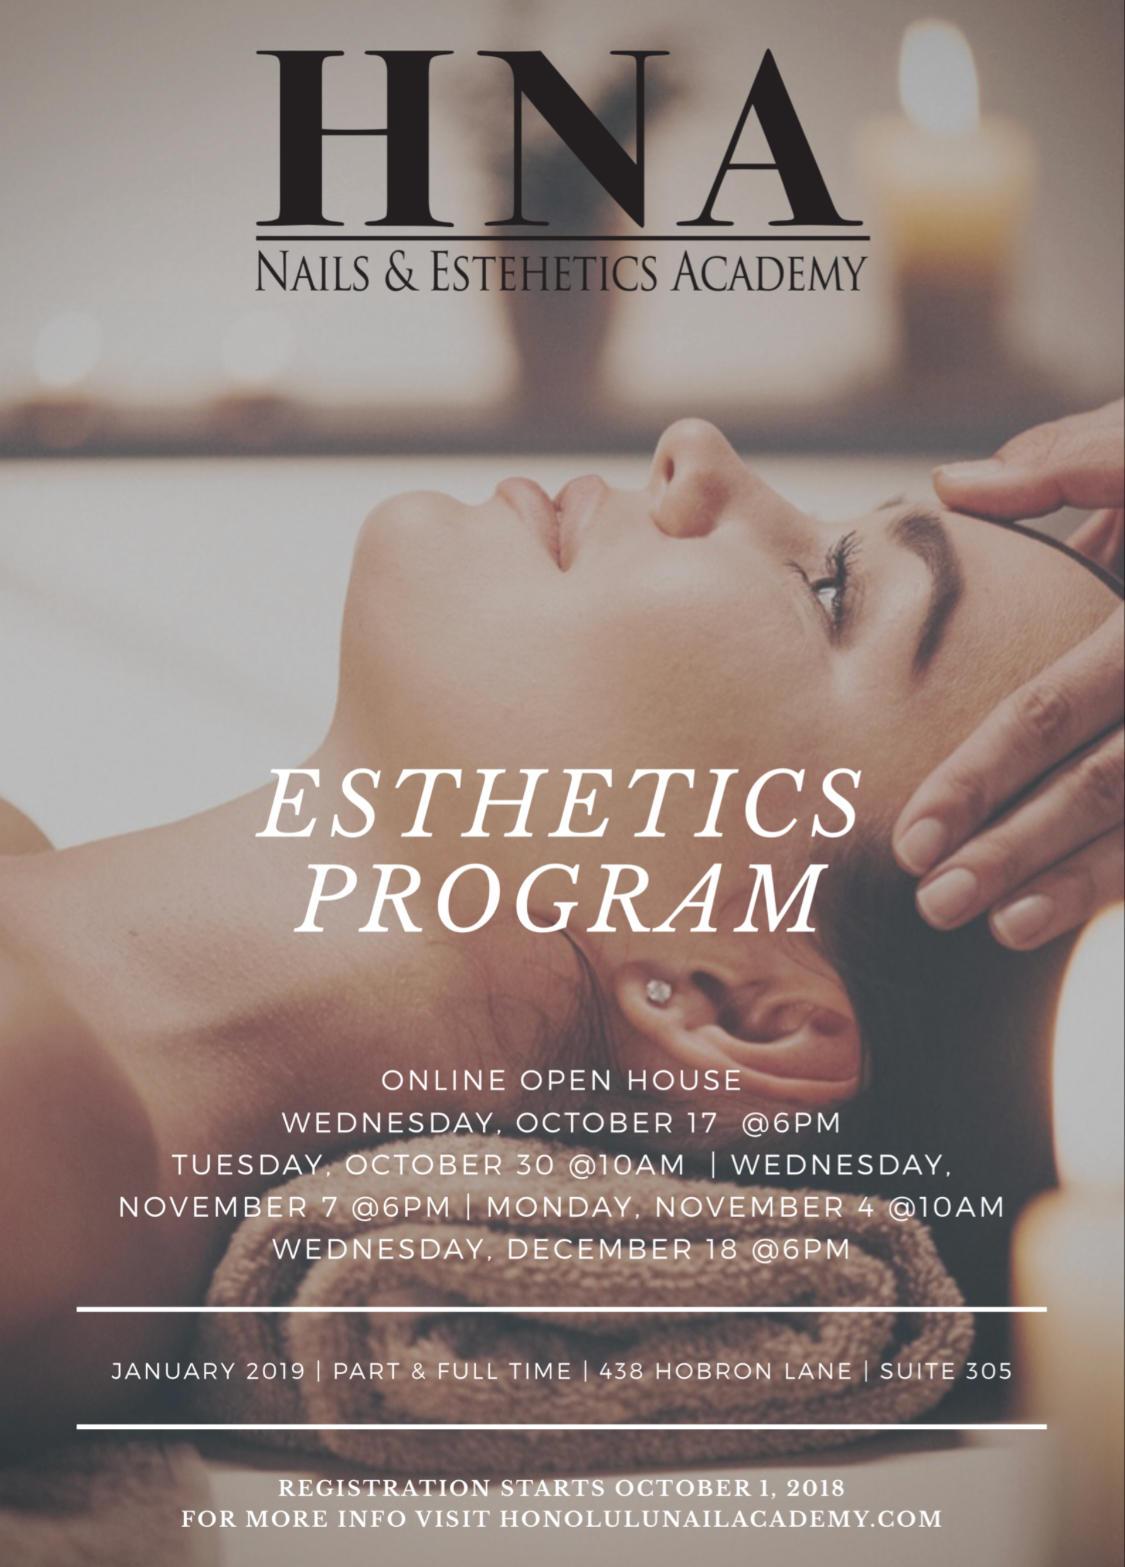 Honolulu Nails & Esthetics Academy (ネイル&エステ) image 31